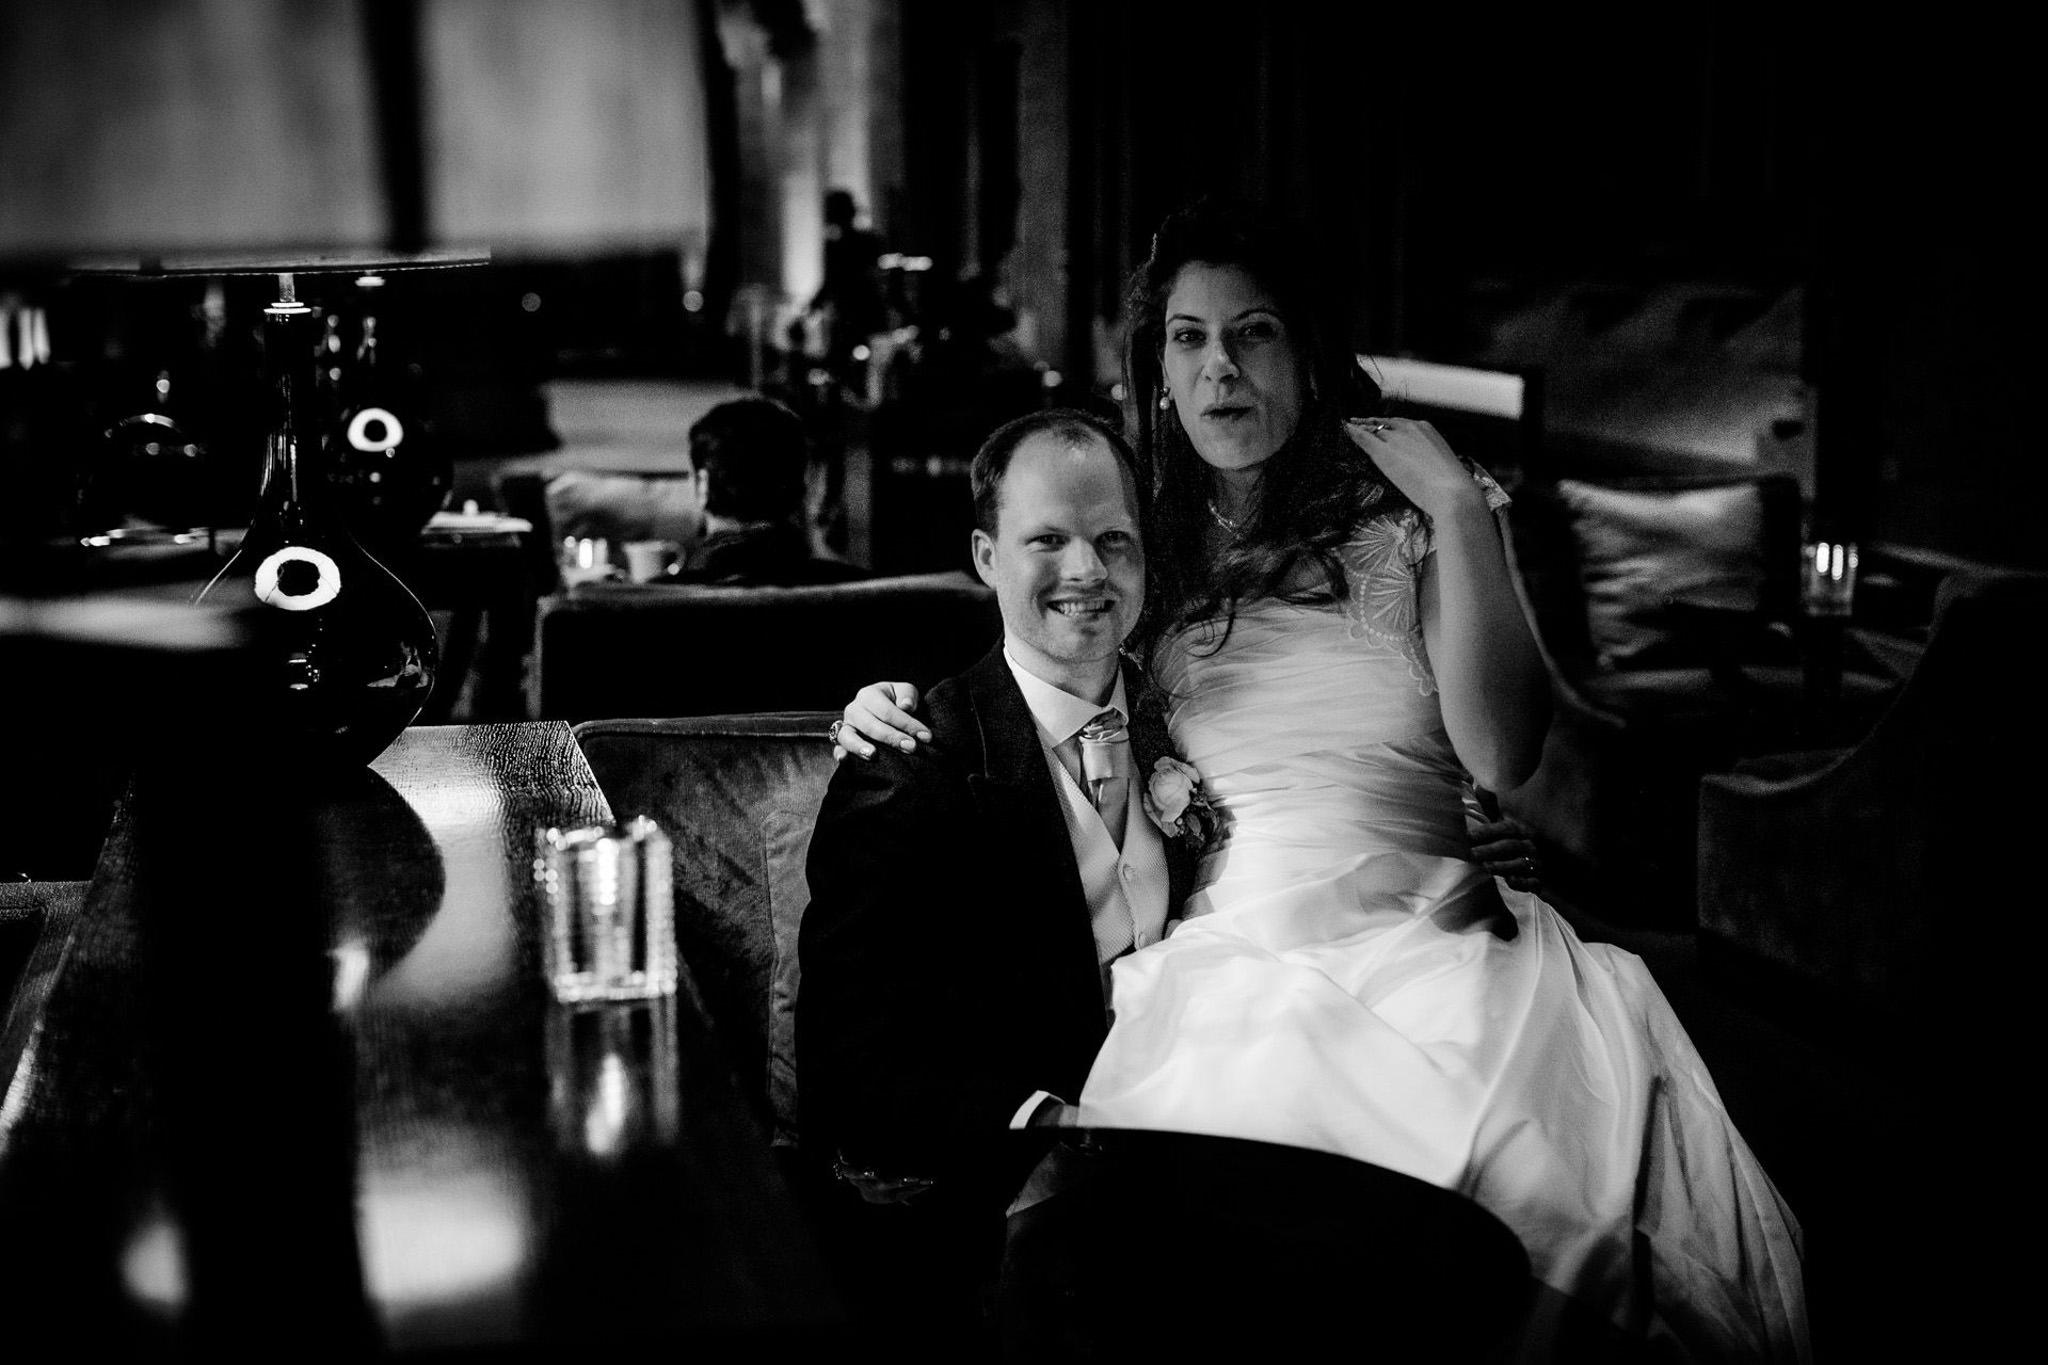 St. Pancras hotel wedding bride and groom posing